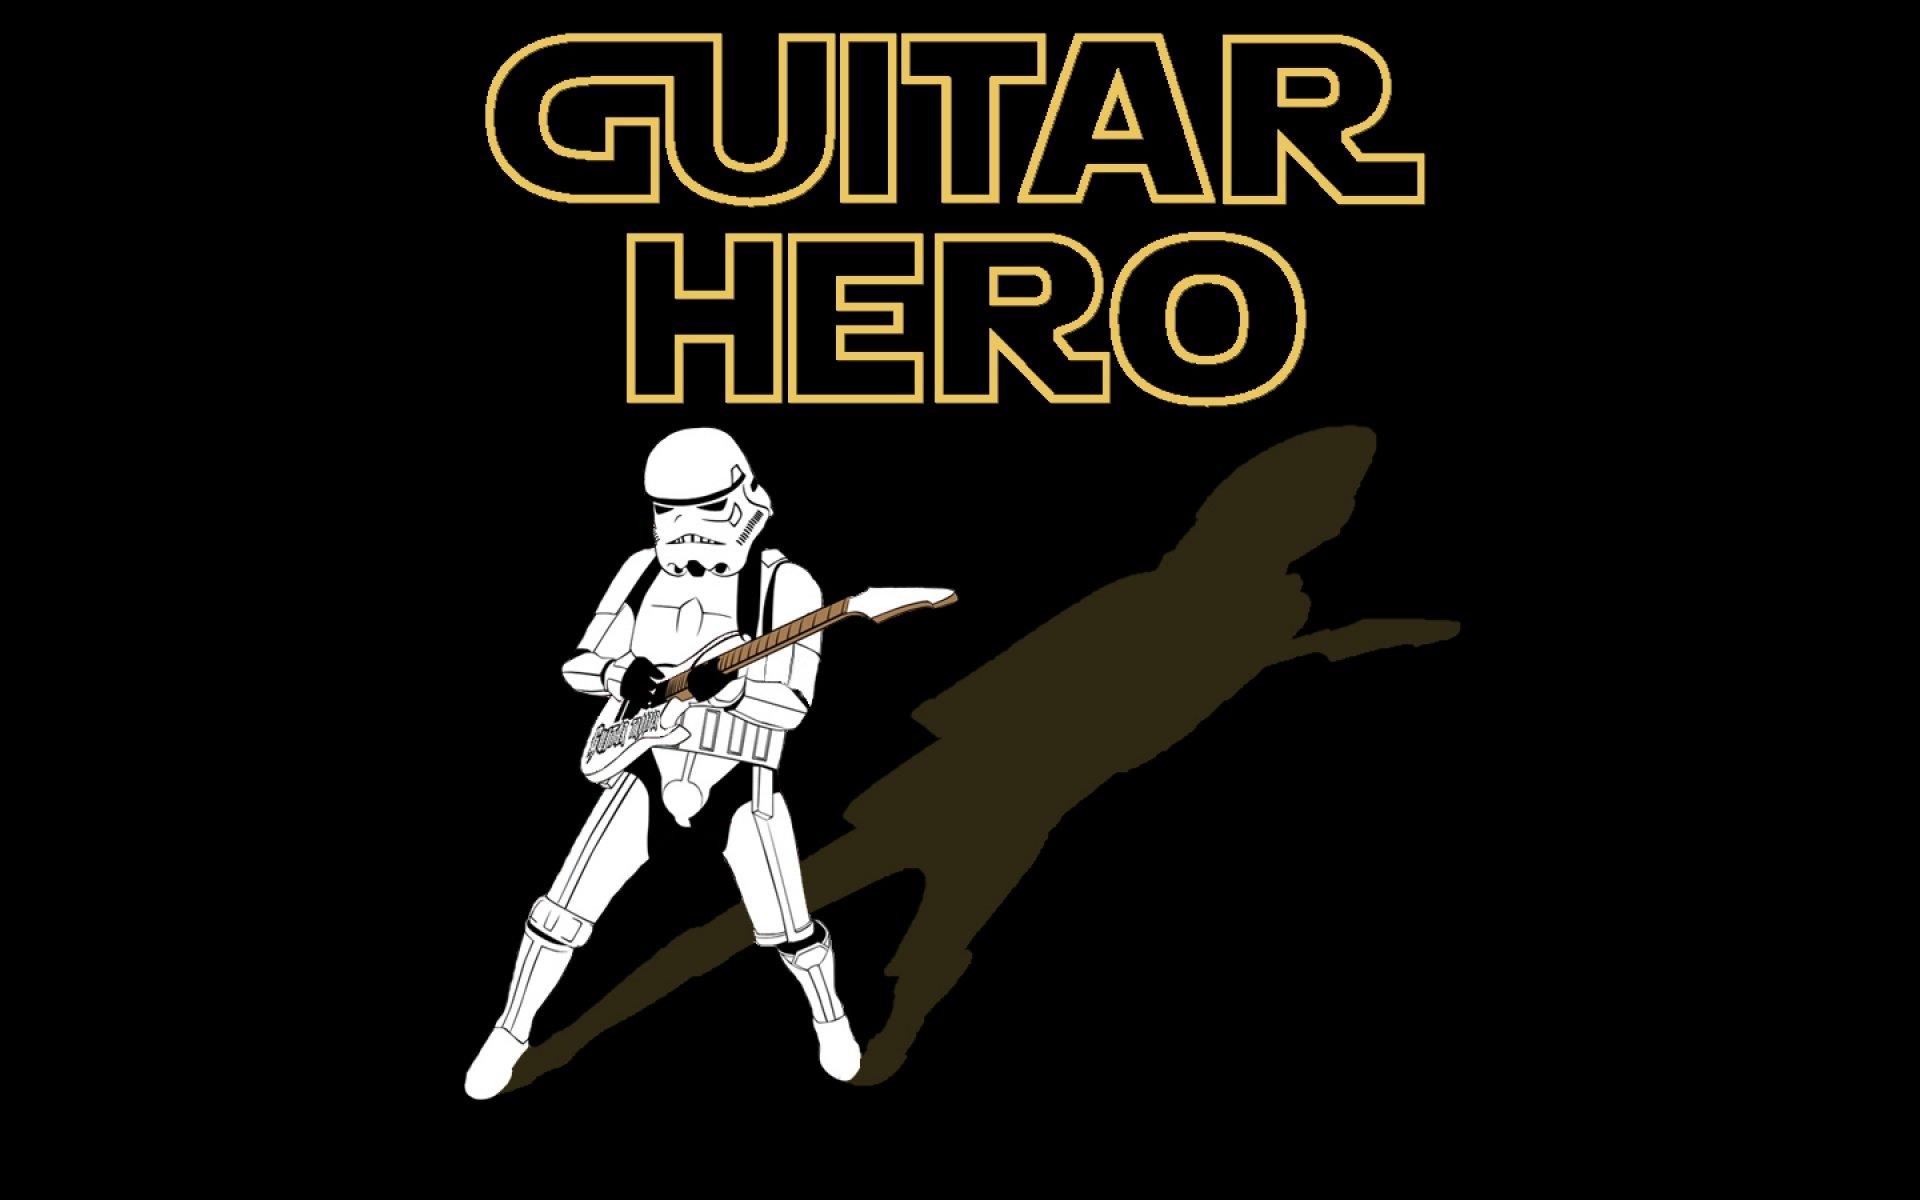 Guitar hero music guitars heavy metal rock hard 1ghero rhythm guitarhero star wars wallpaper - Guitar hero 3 hd ...